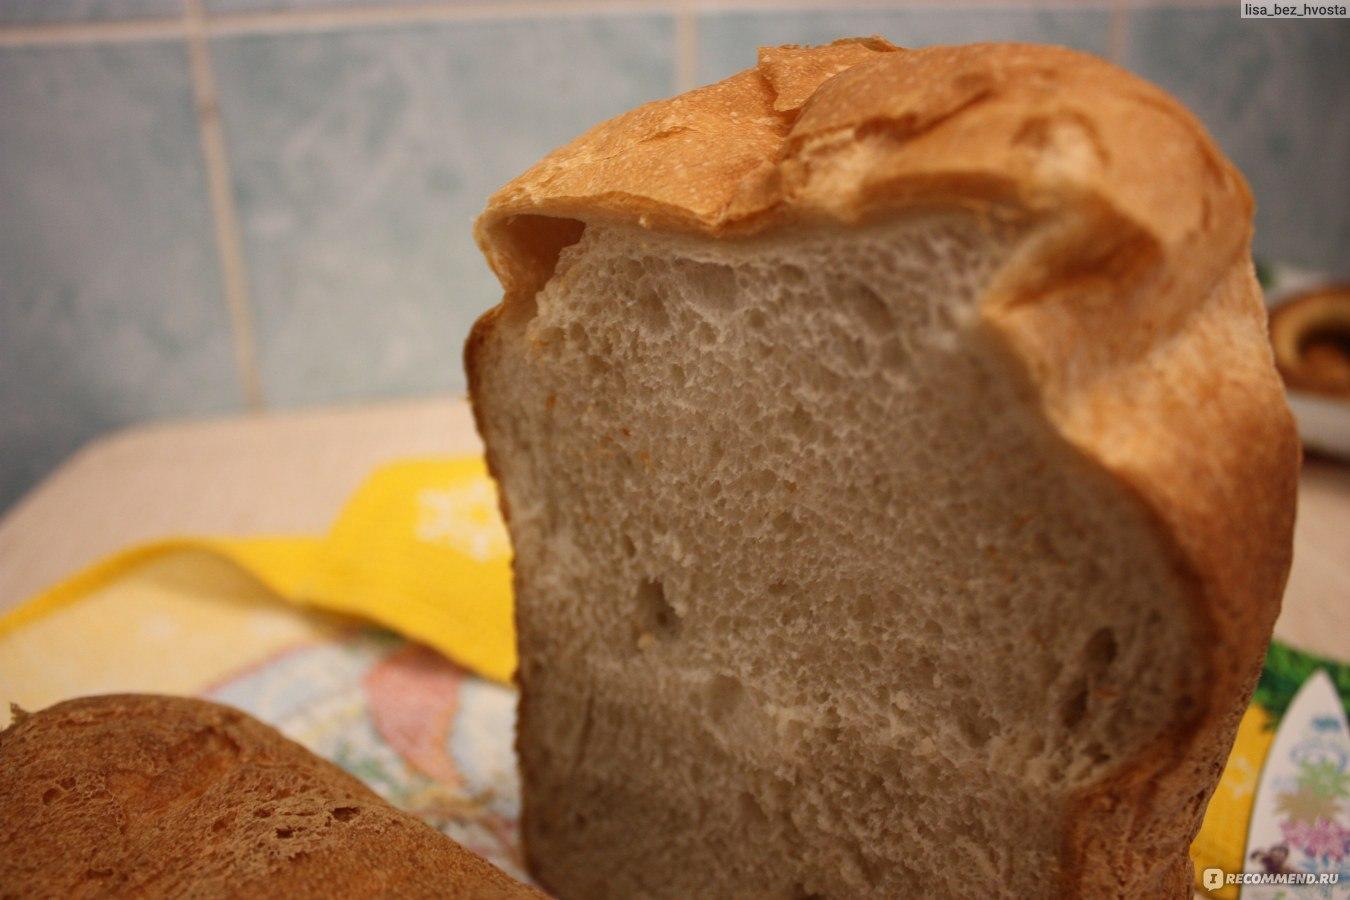 Рецепты для автоматической хлебопекарни lg hb1001cj